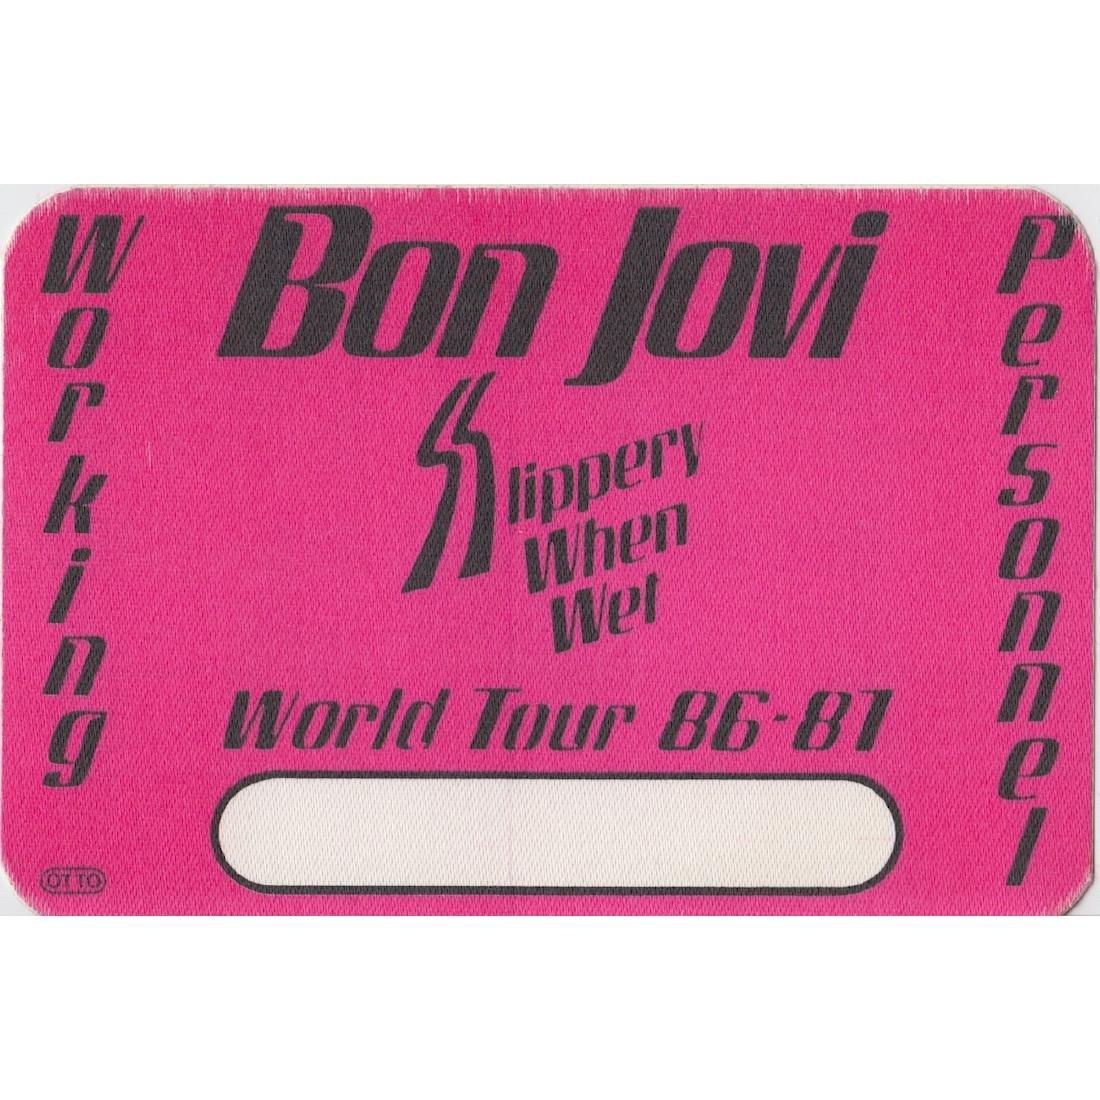 Bon Jovi 1989 Laminated Backstage Pass